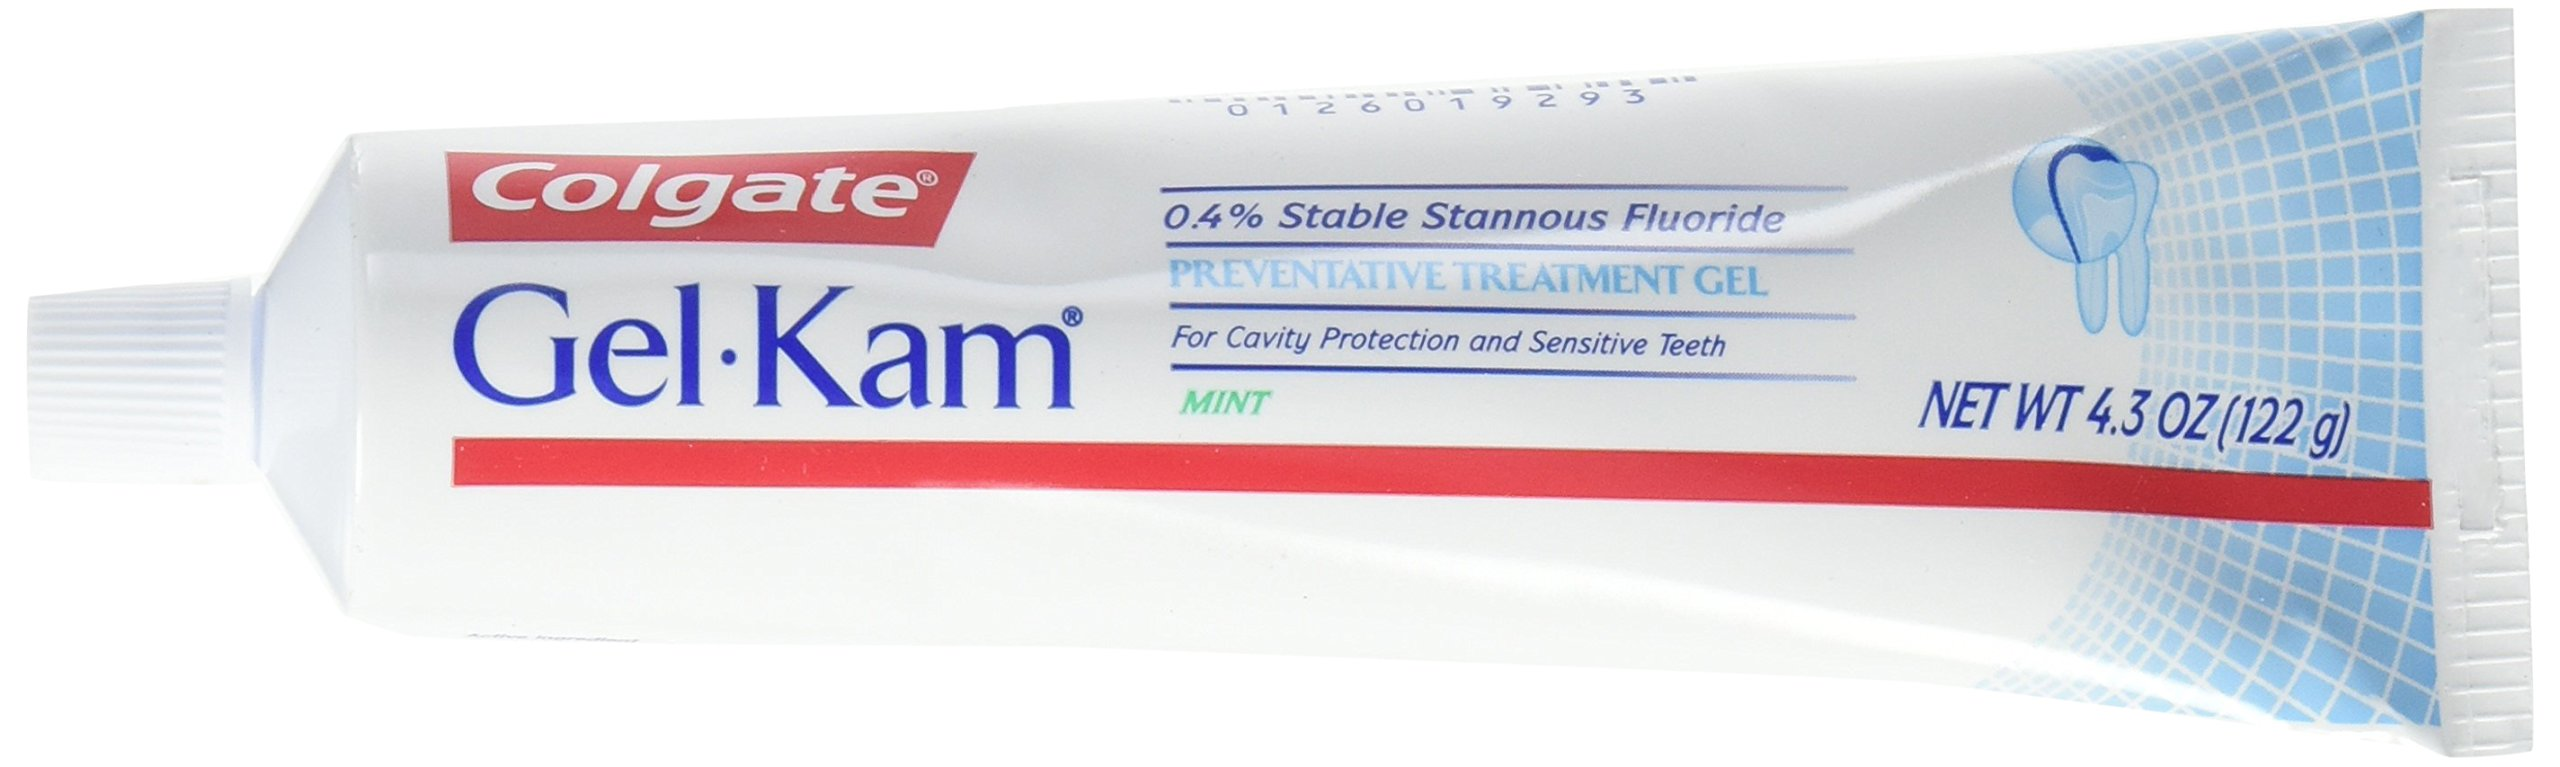 Gel-Kam Fluoride Preventive Treatment Gel Mint Flavor 4.30 oz